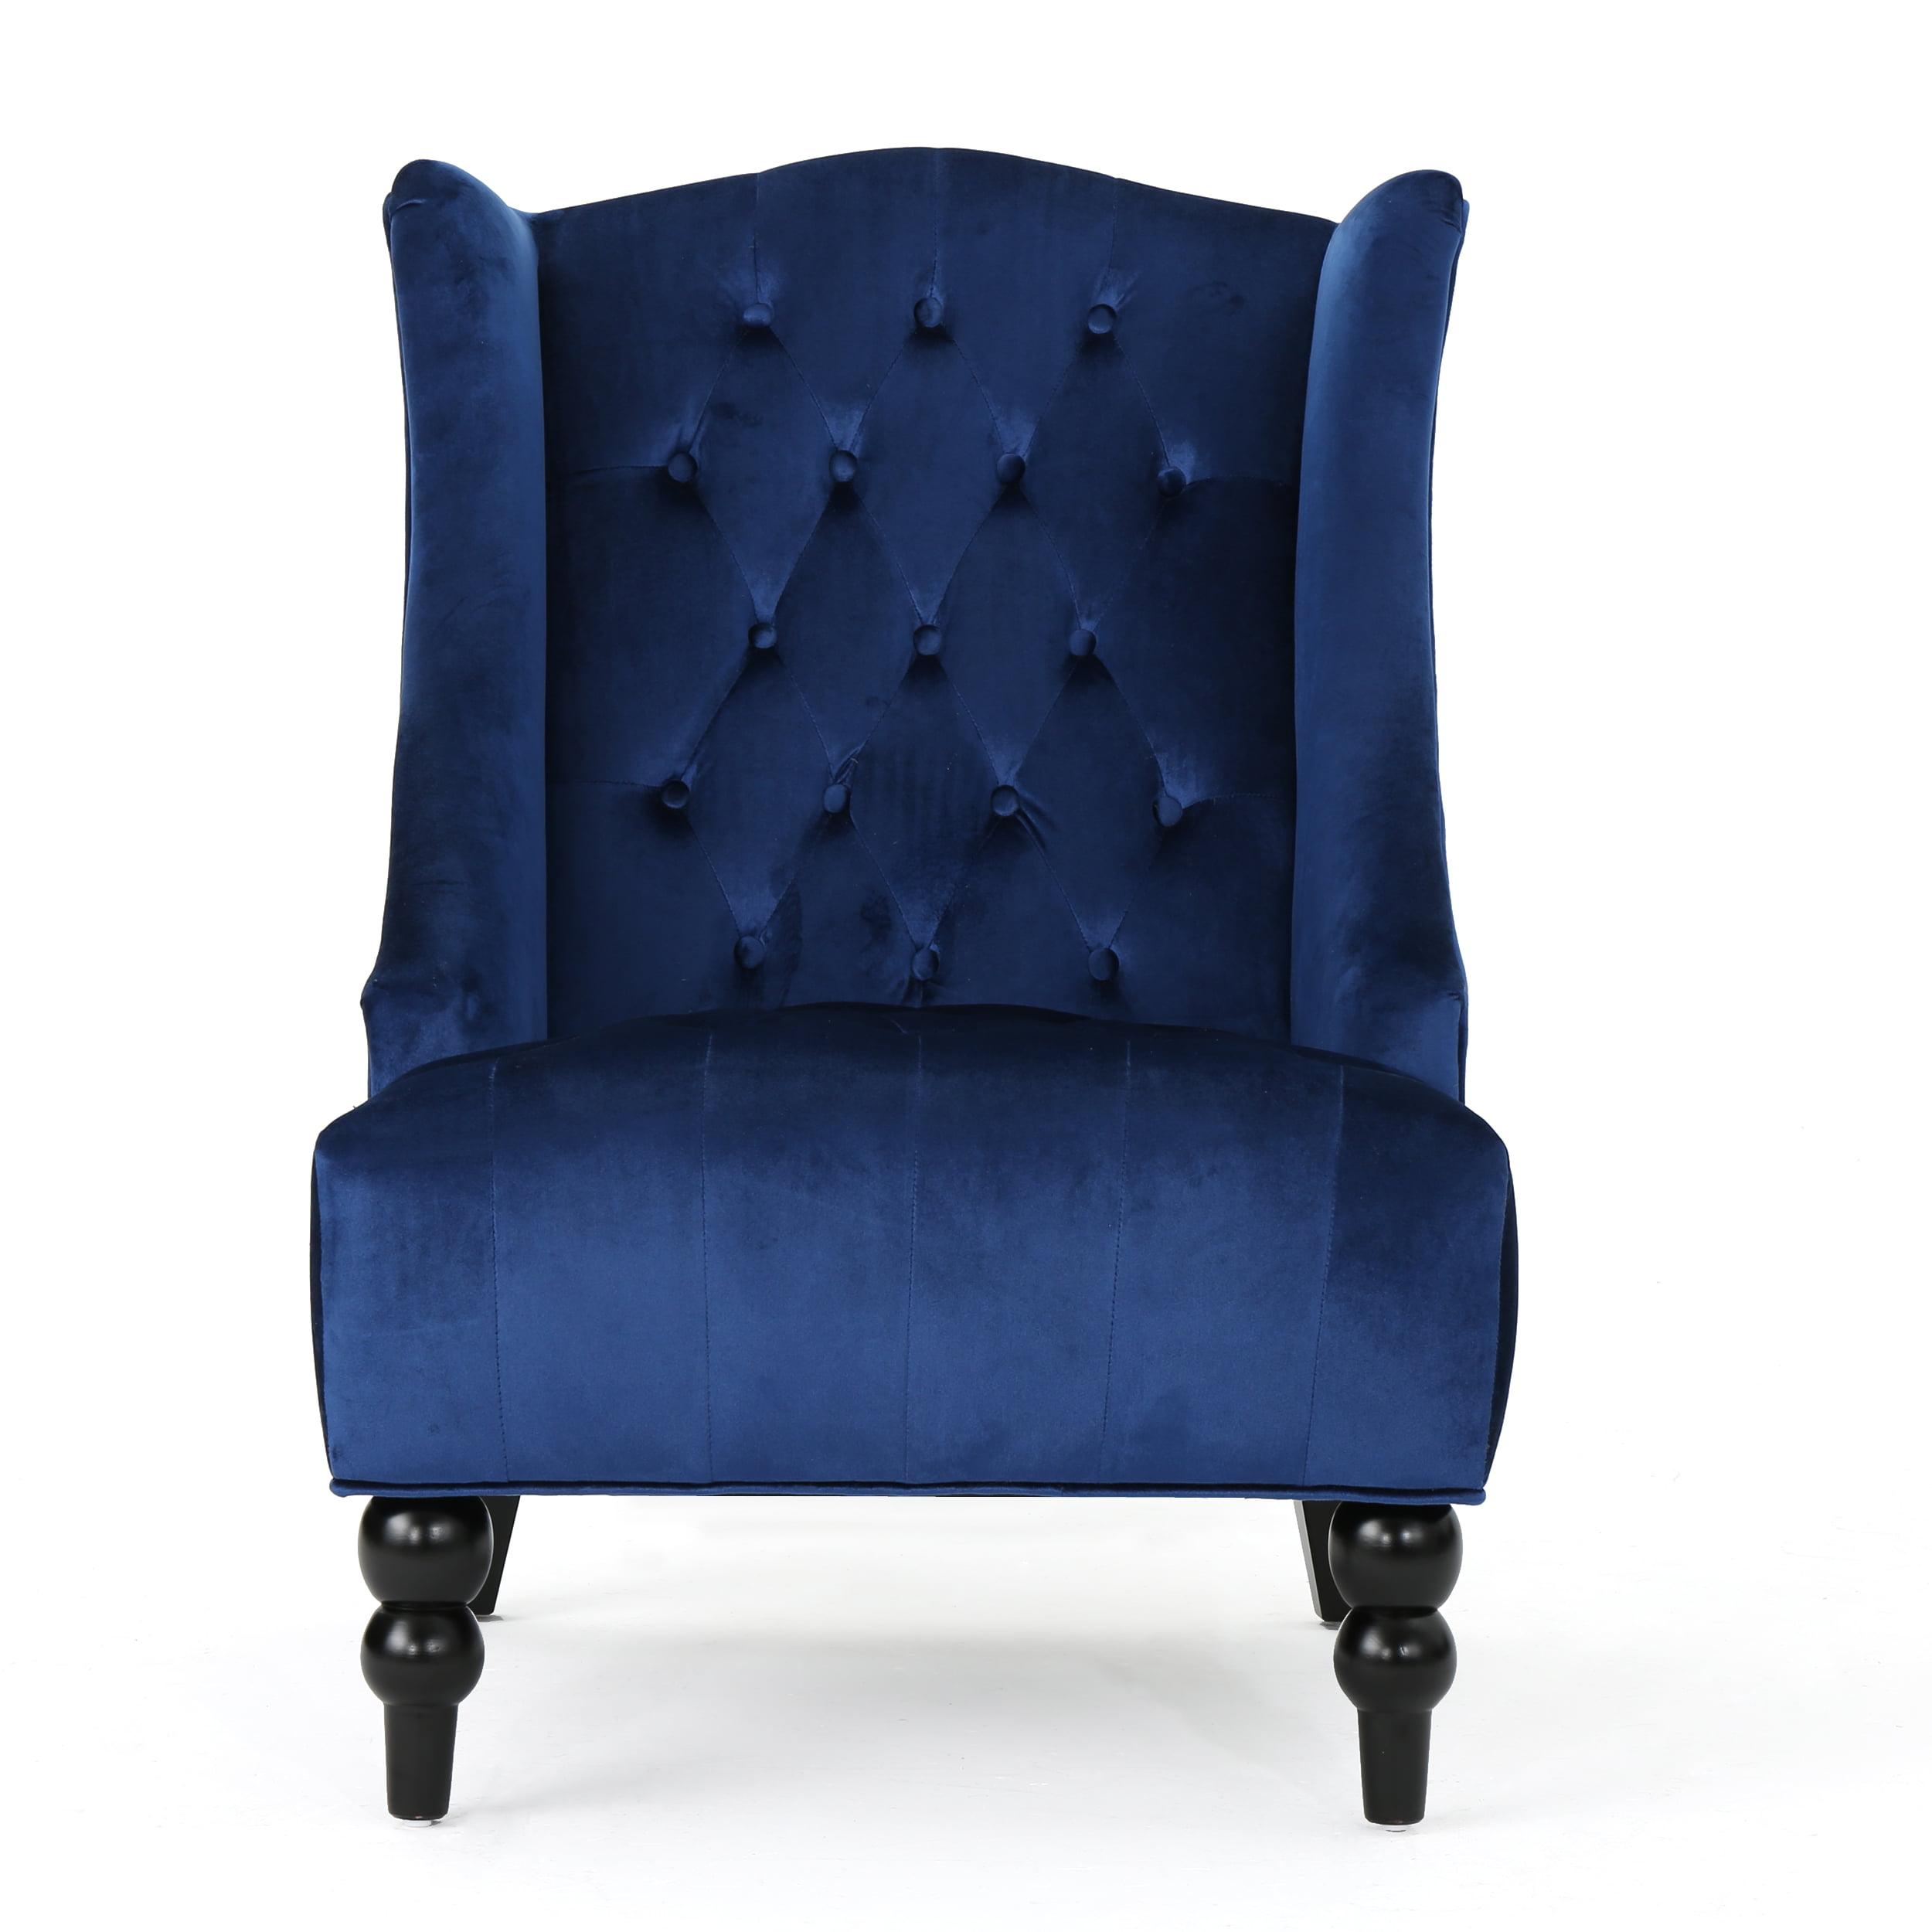 Talisa High-Back New Velvet Club Chair, Navy Blue by GDF Studio